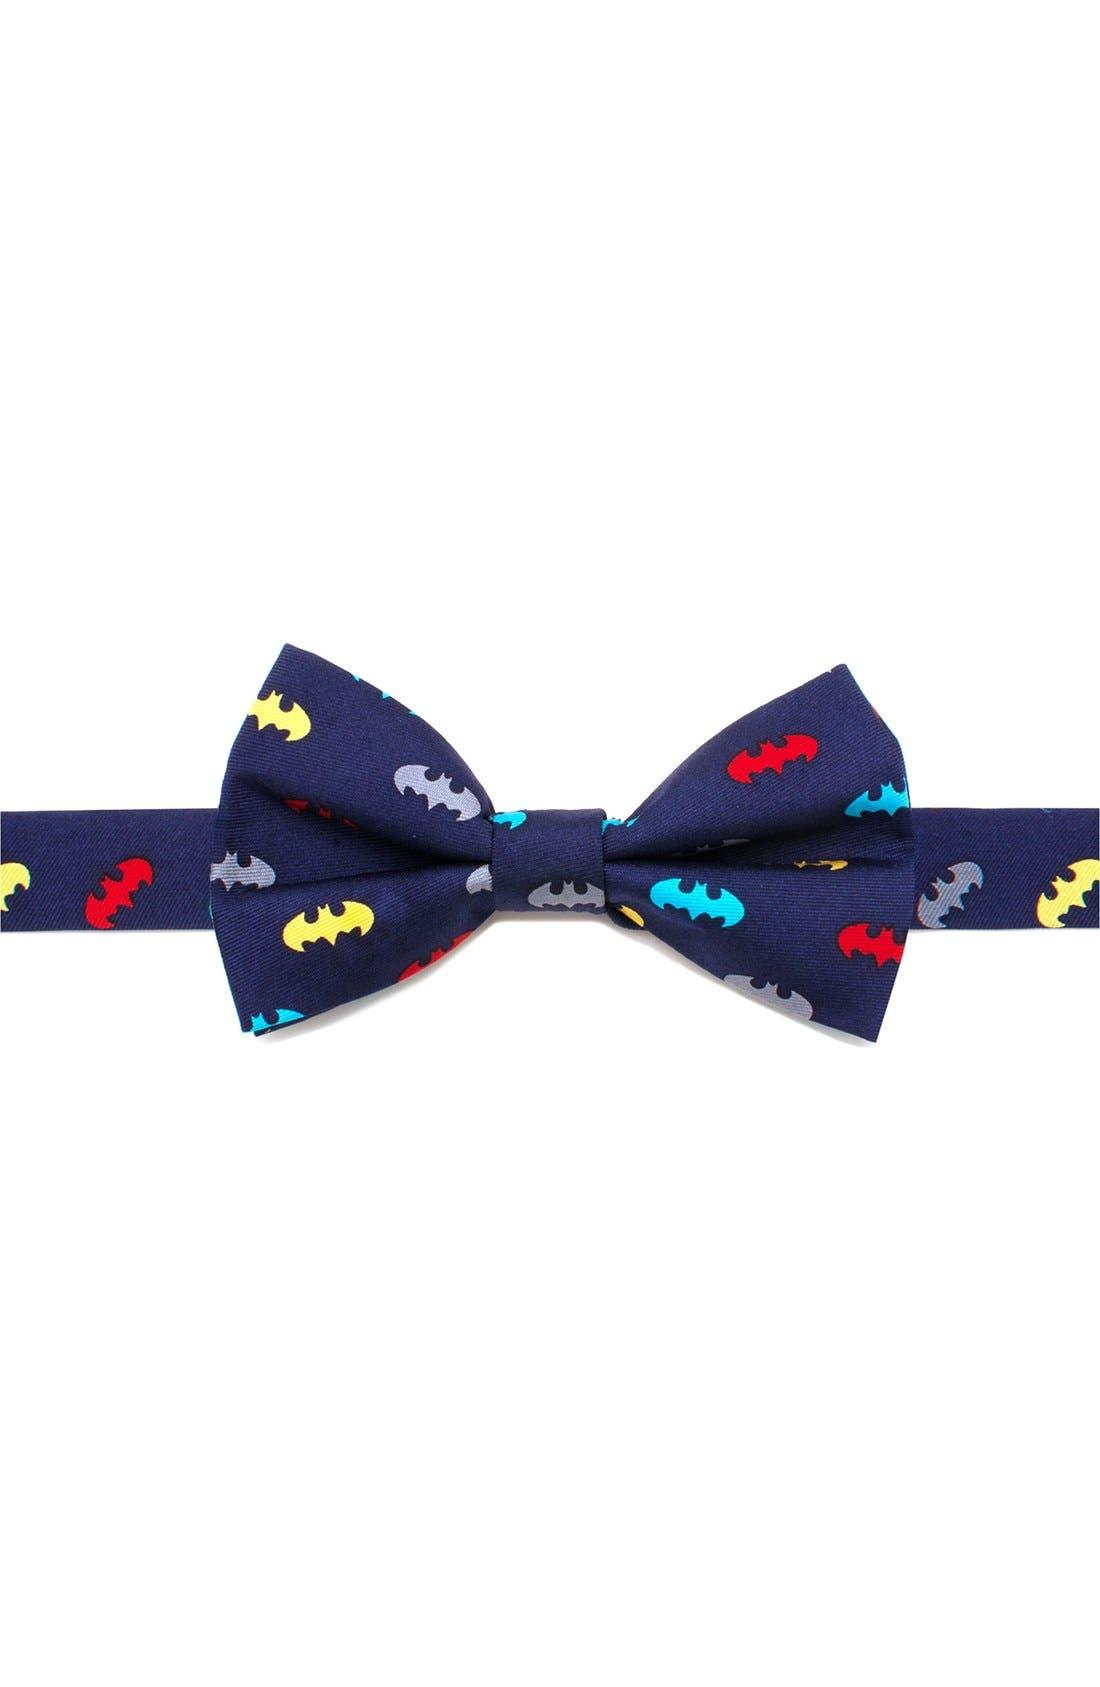 'Batman' Silk Bow Tie,                             Main thumbnail 1, color,                             Multi